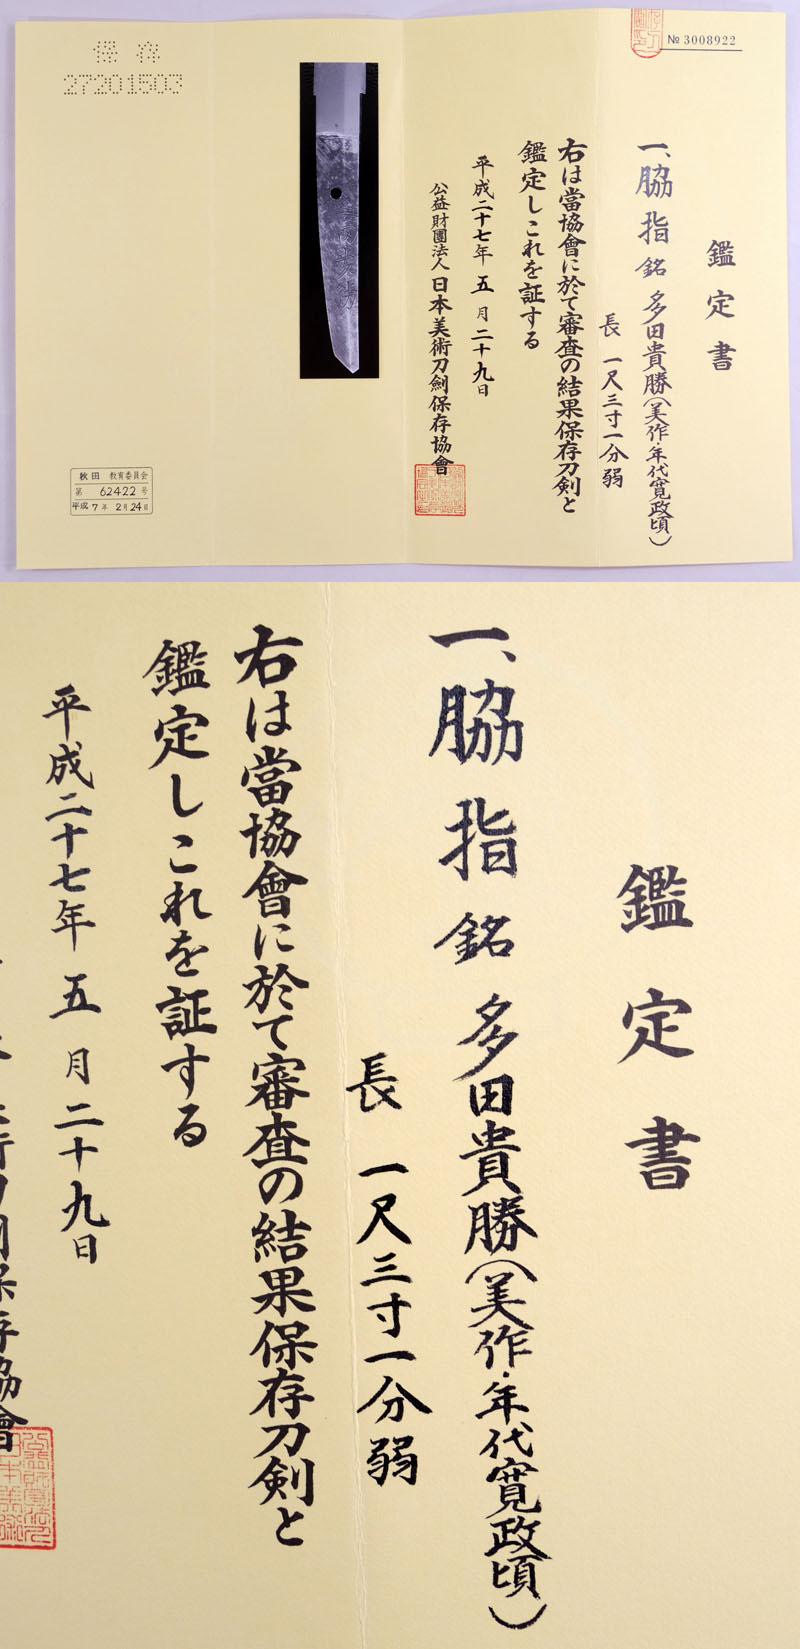 多田貴勝(美作・年代KANSEI 頃) Picture of Certificate